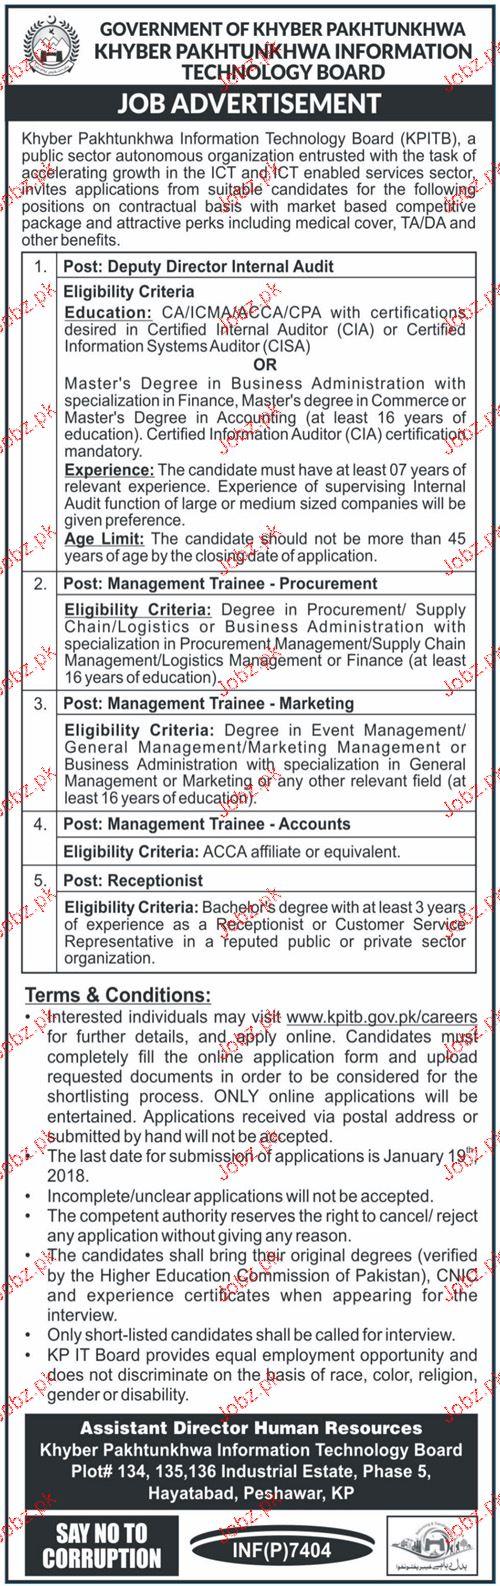 Khyber Pakhtunkhwa Information Technology Board KPITB Job